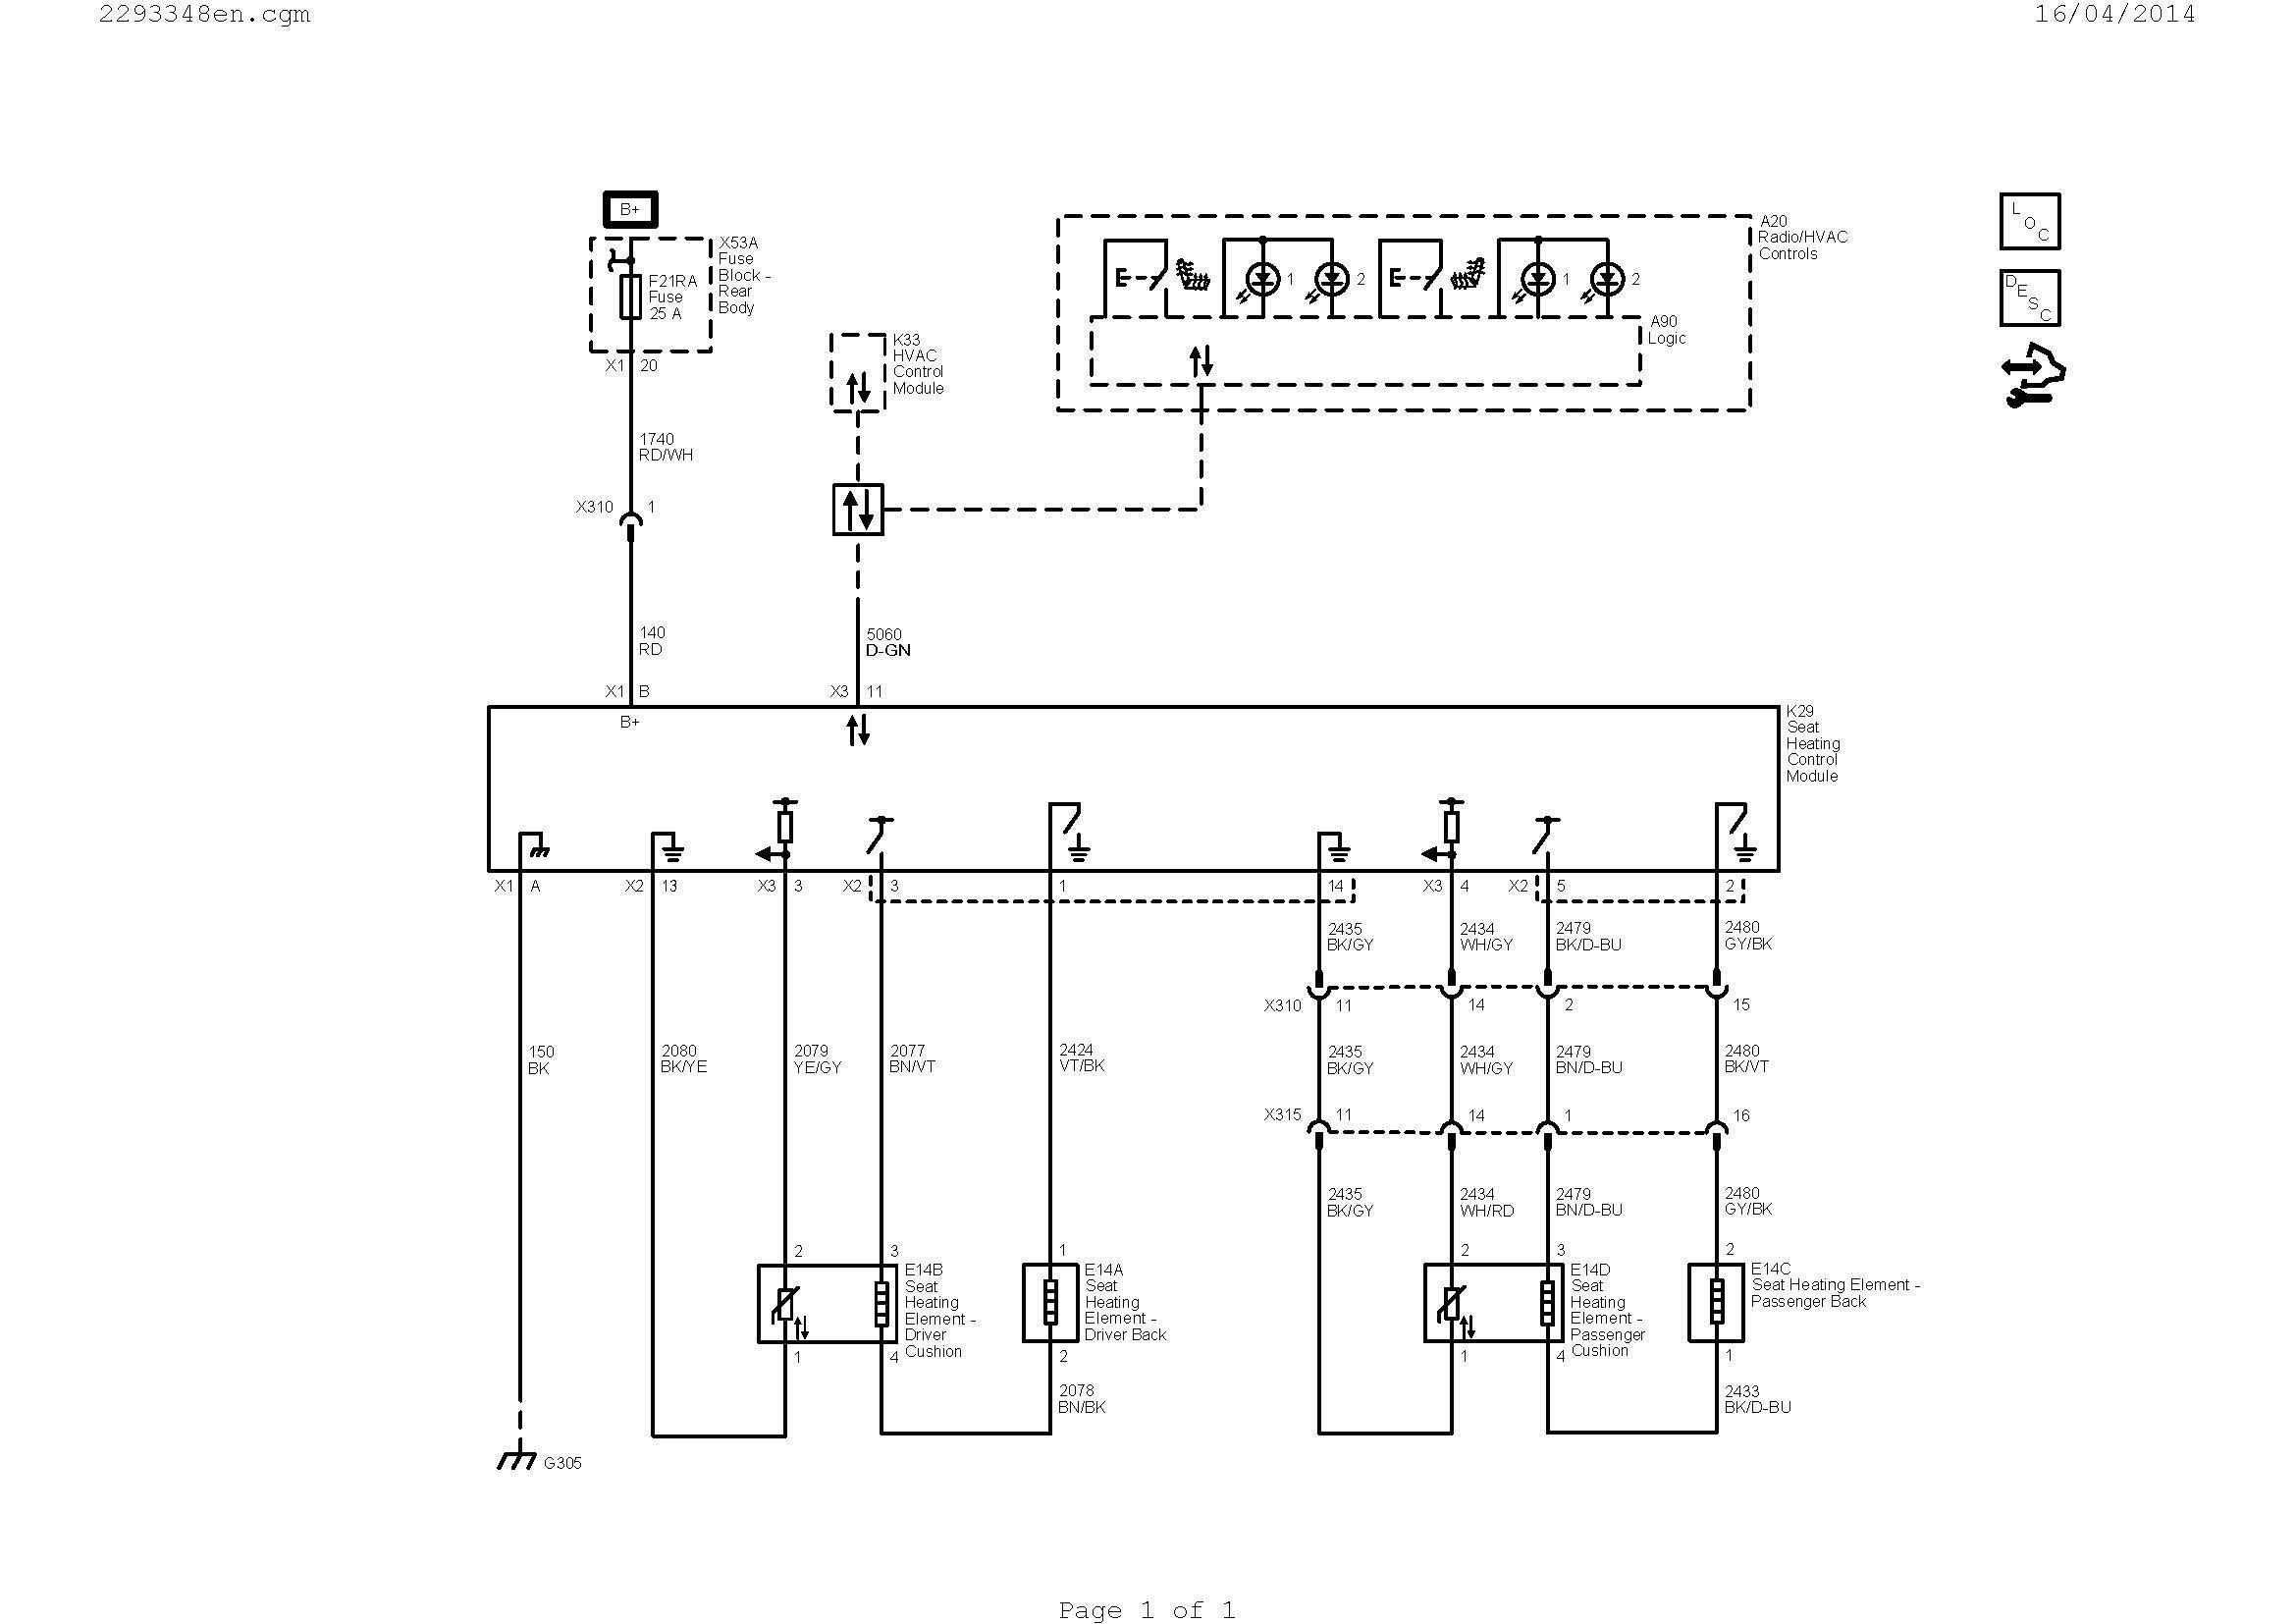 subwoofer wiring diagram Download-Wiring Diagram Schematic New Wiring Diagram Guitar Fresh Hvac Diagram Best Hvac Diagram 0d 4-j